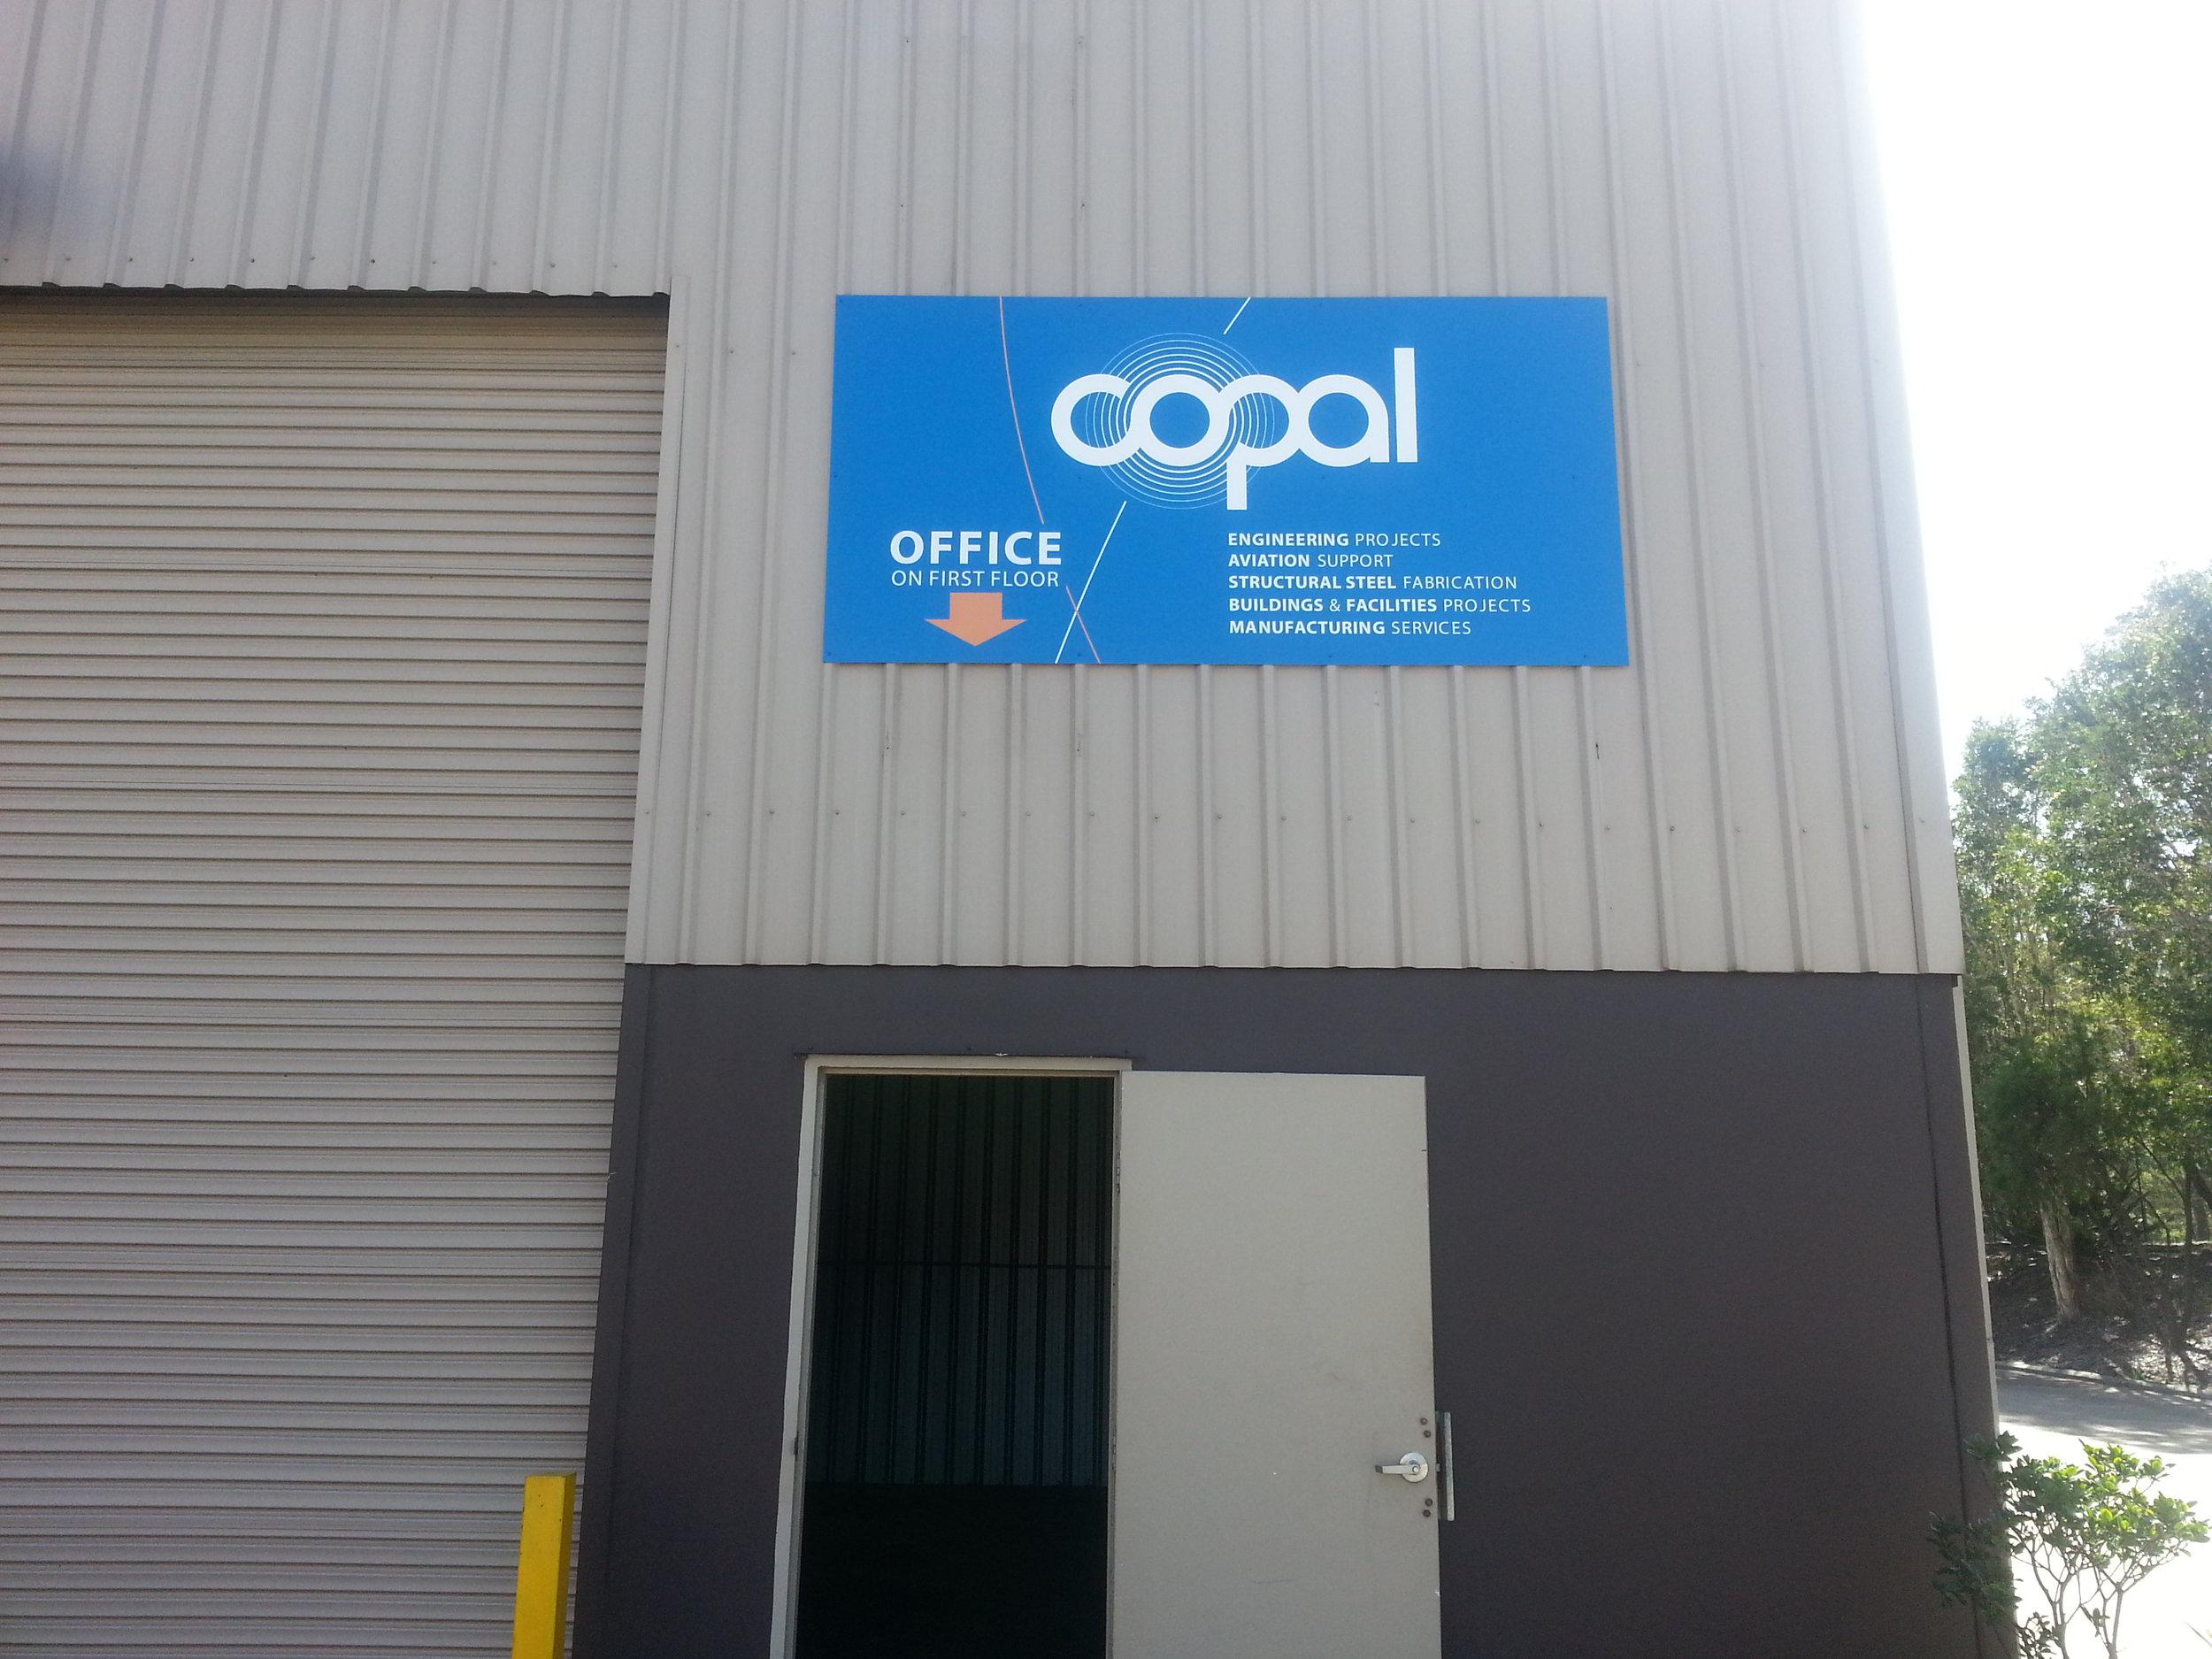 copal entrance sign